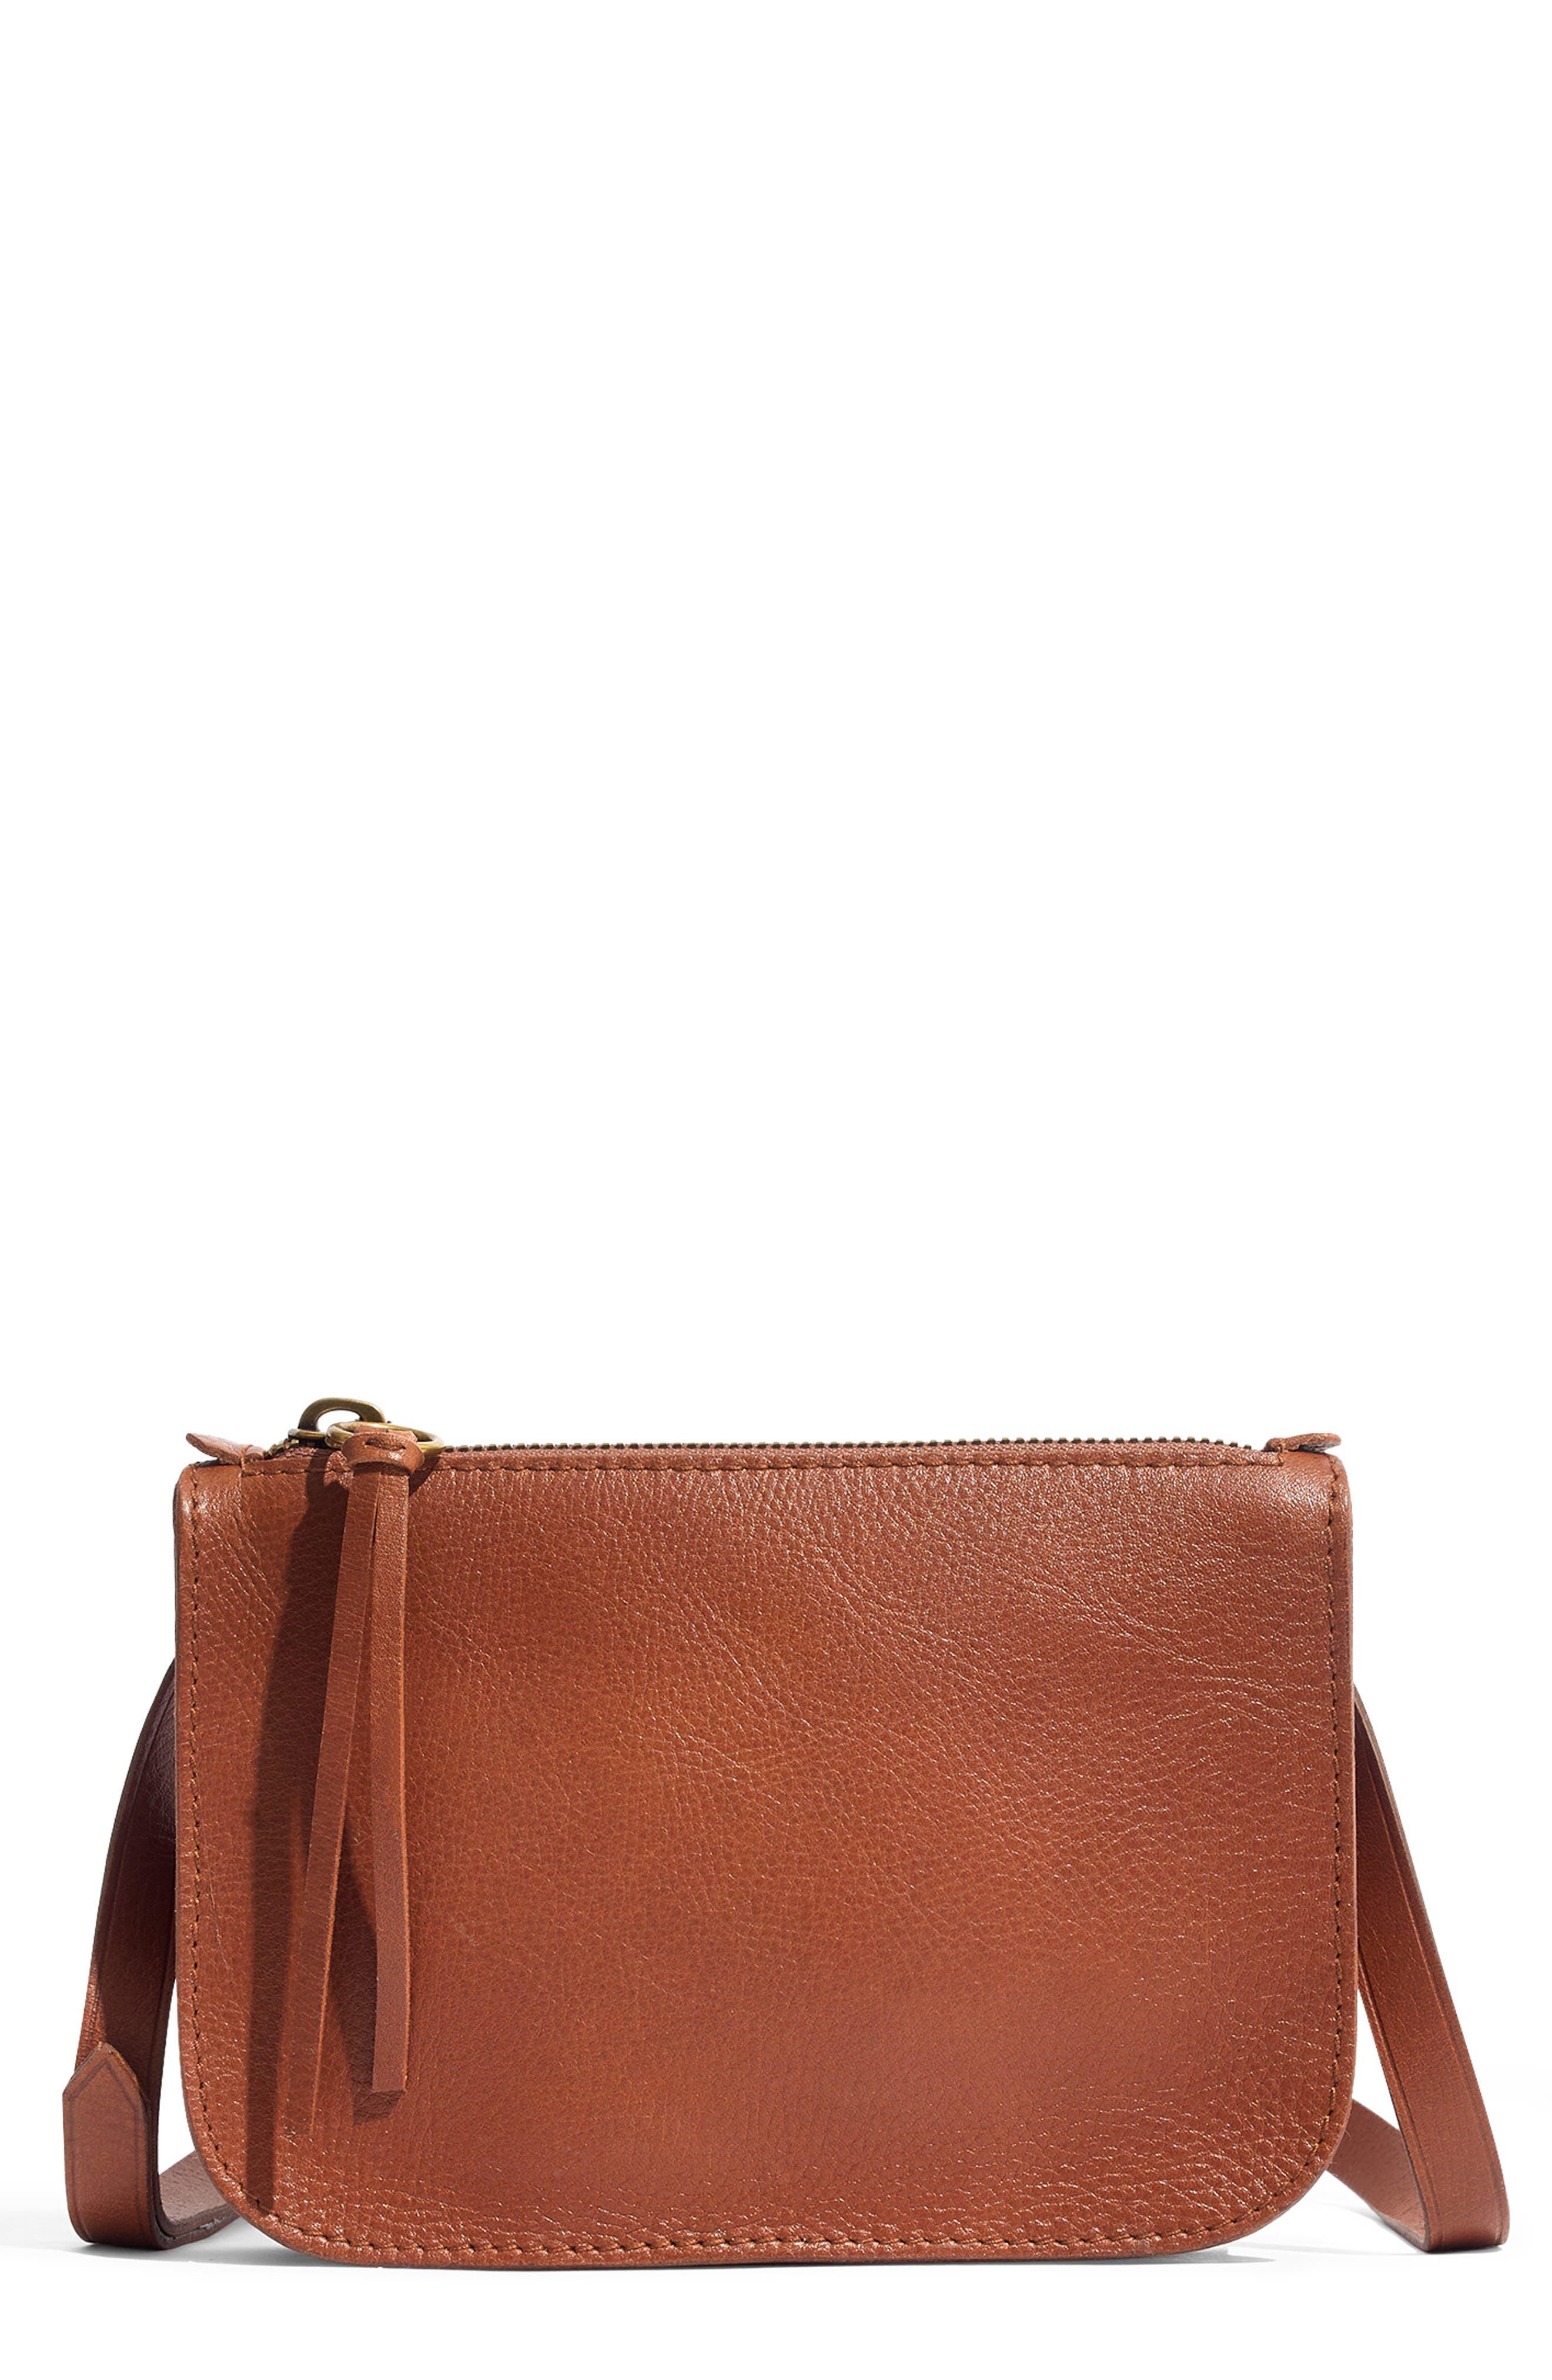 The Simple Pouch Belt Bag,                             Main thumbnail 1, color,                             ENGLISH SADDLE